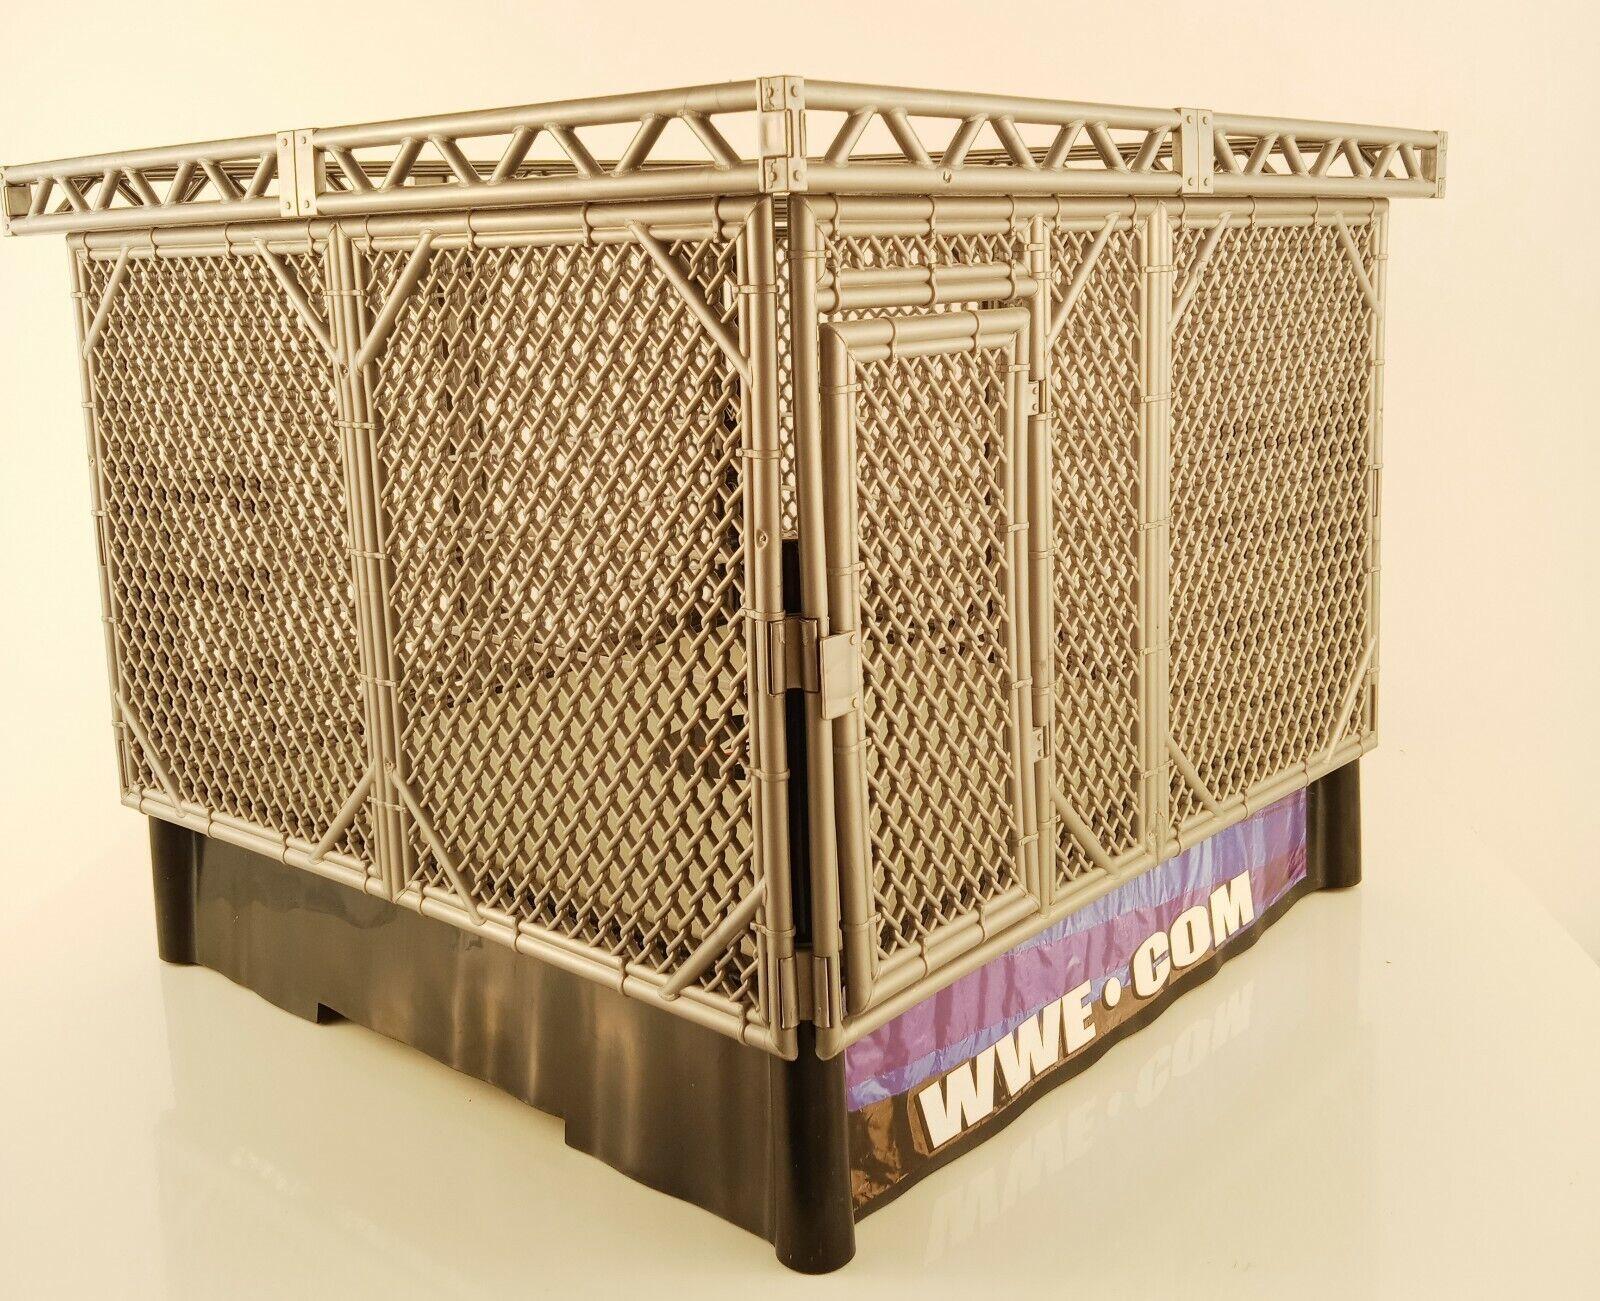 GABBIA D'ACCIAIO WWE SMACKDOWN springloaded Wrestling Ring 2010 Mattel